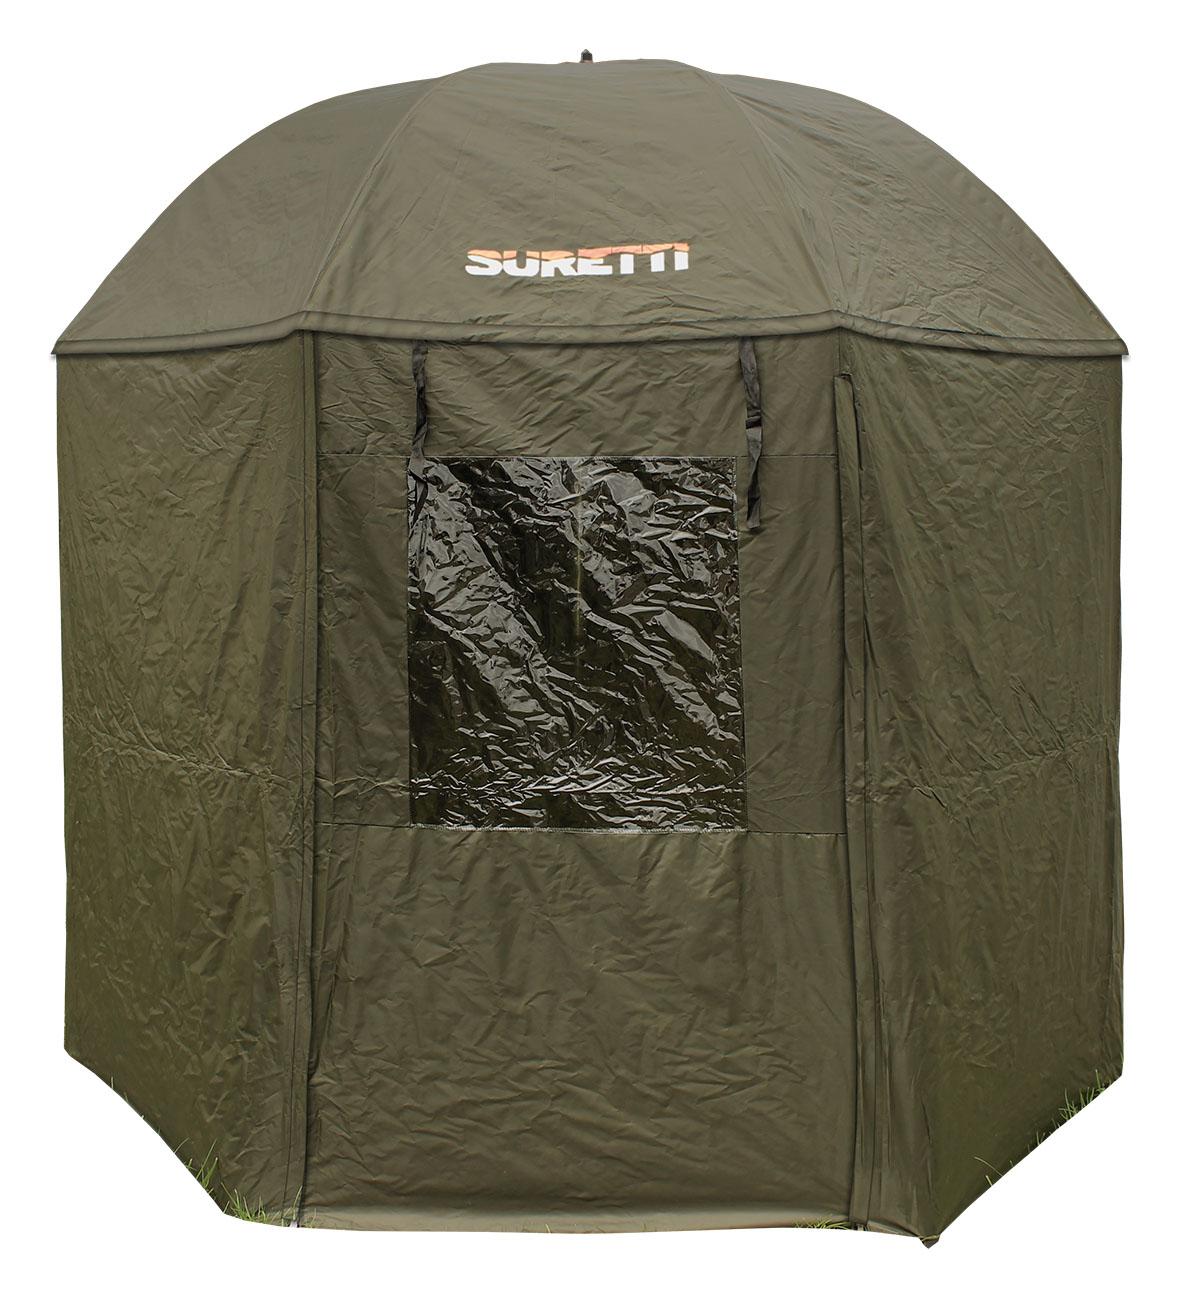 Suretti Deštník s bočnicí Full Cover